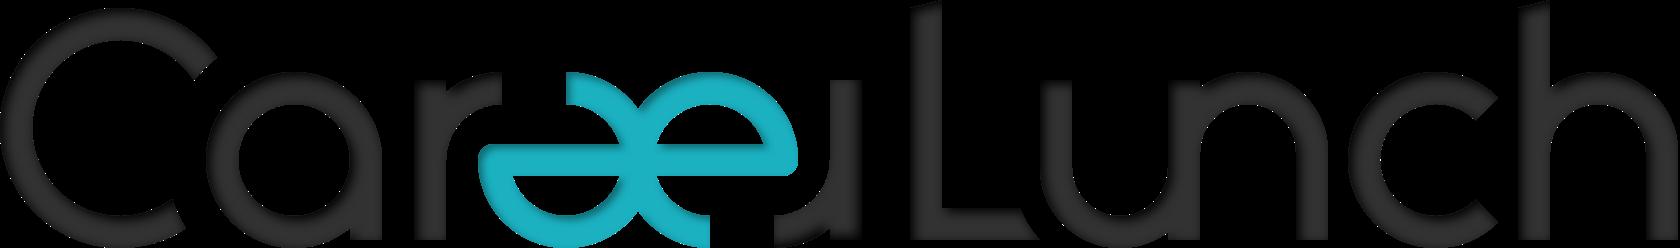 CareerLunch Logo